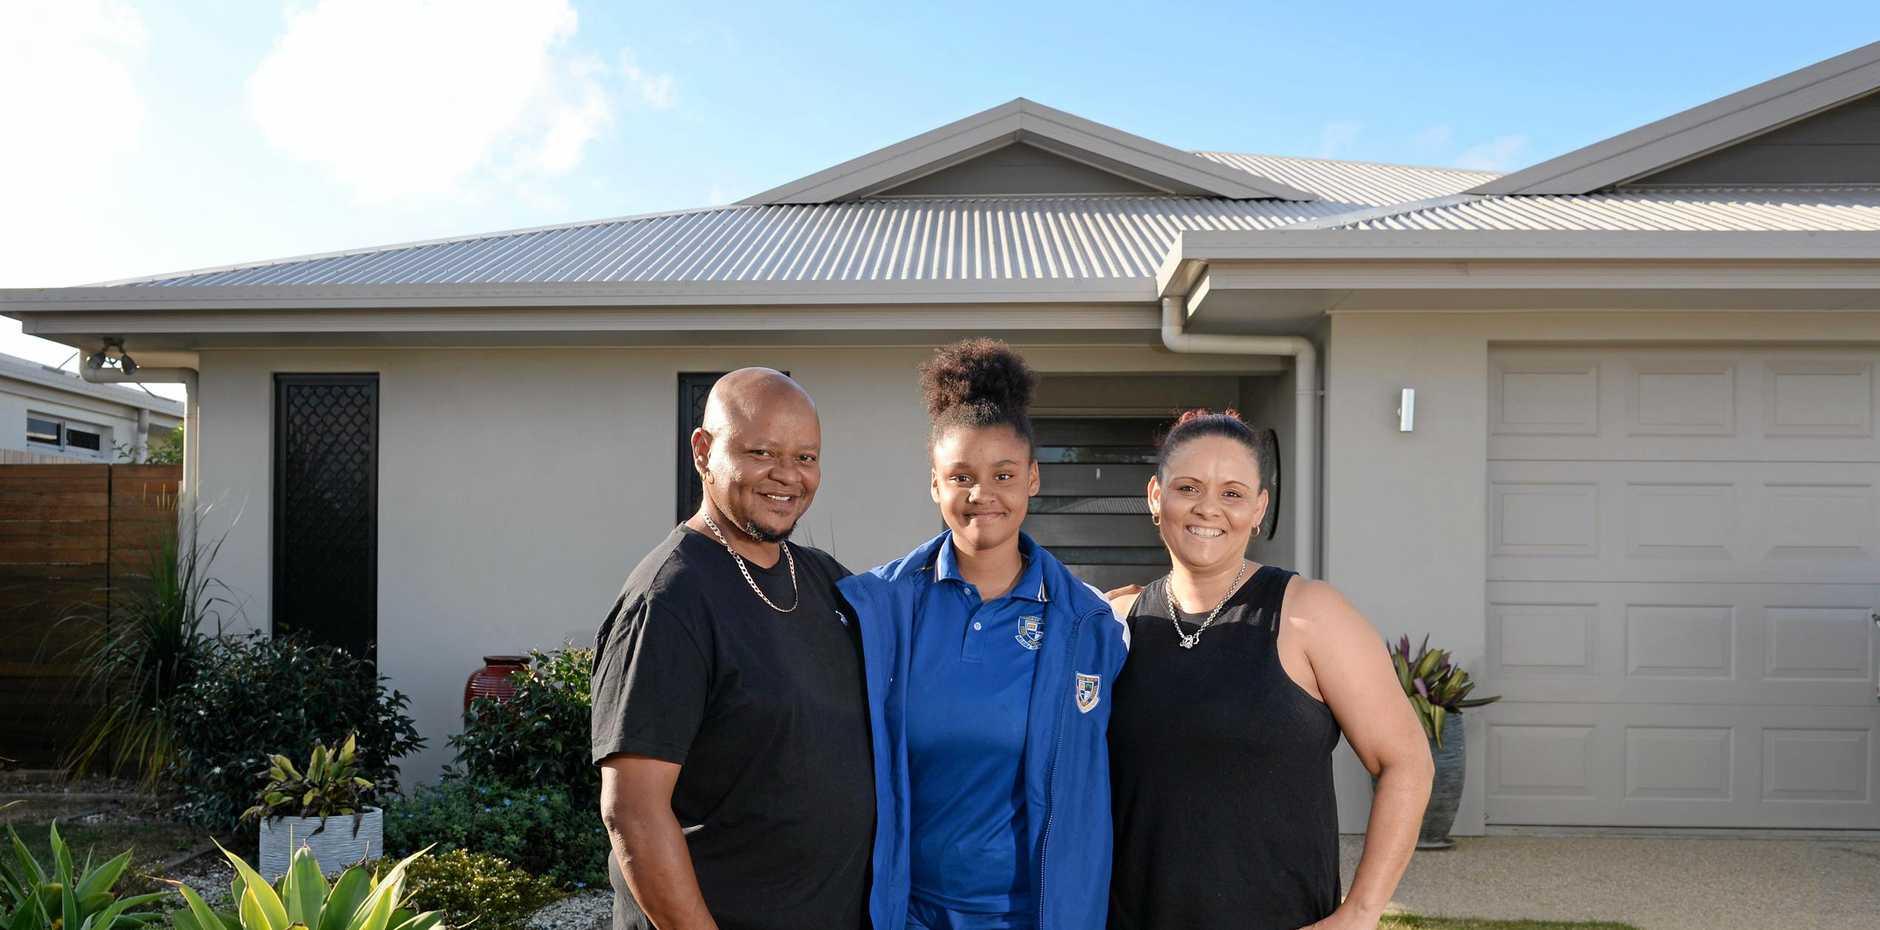 SUPPORTIVE COMMUNITY: Ricardo, Ciara and Sonia Davids at home in Mt Pleasant.